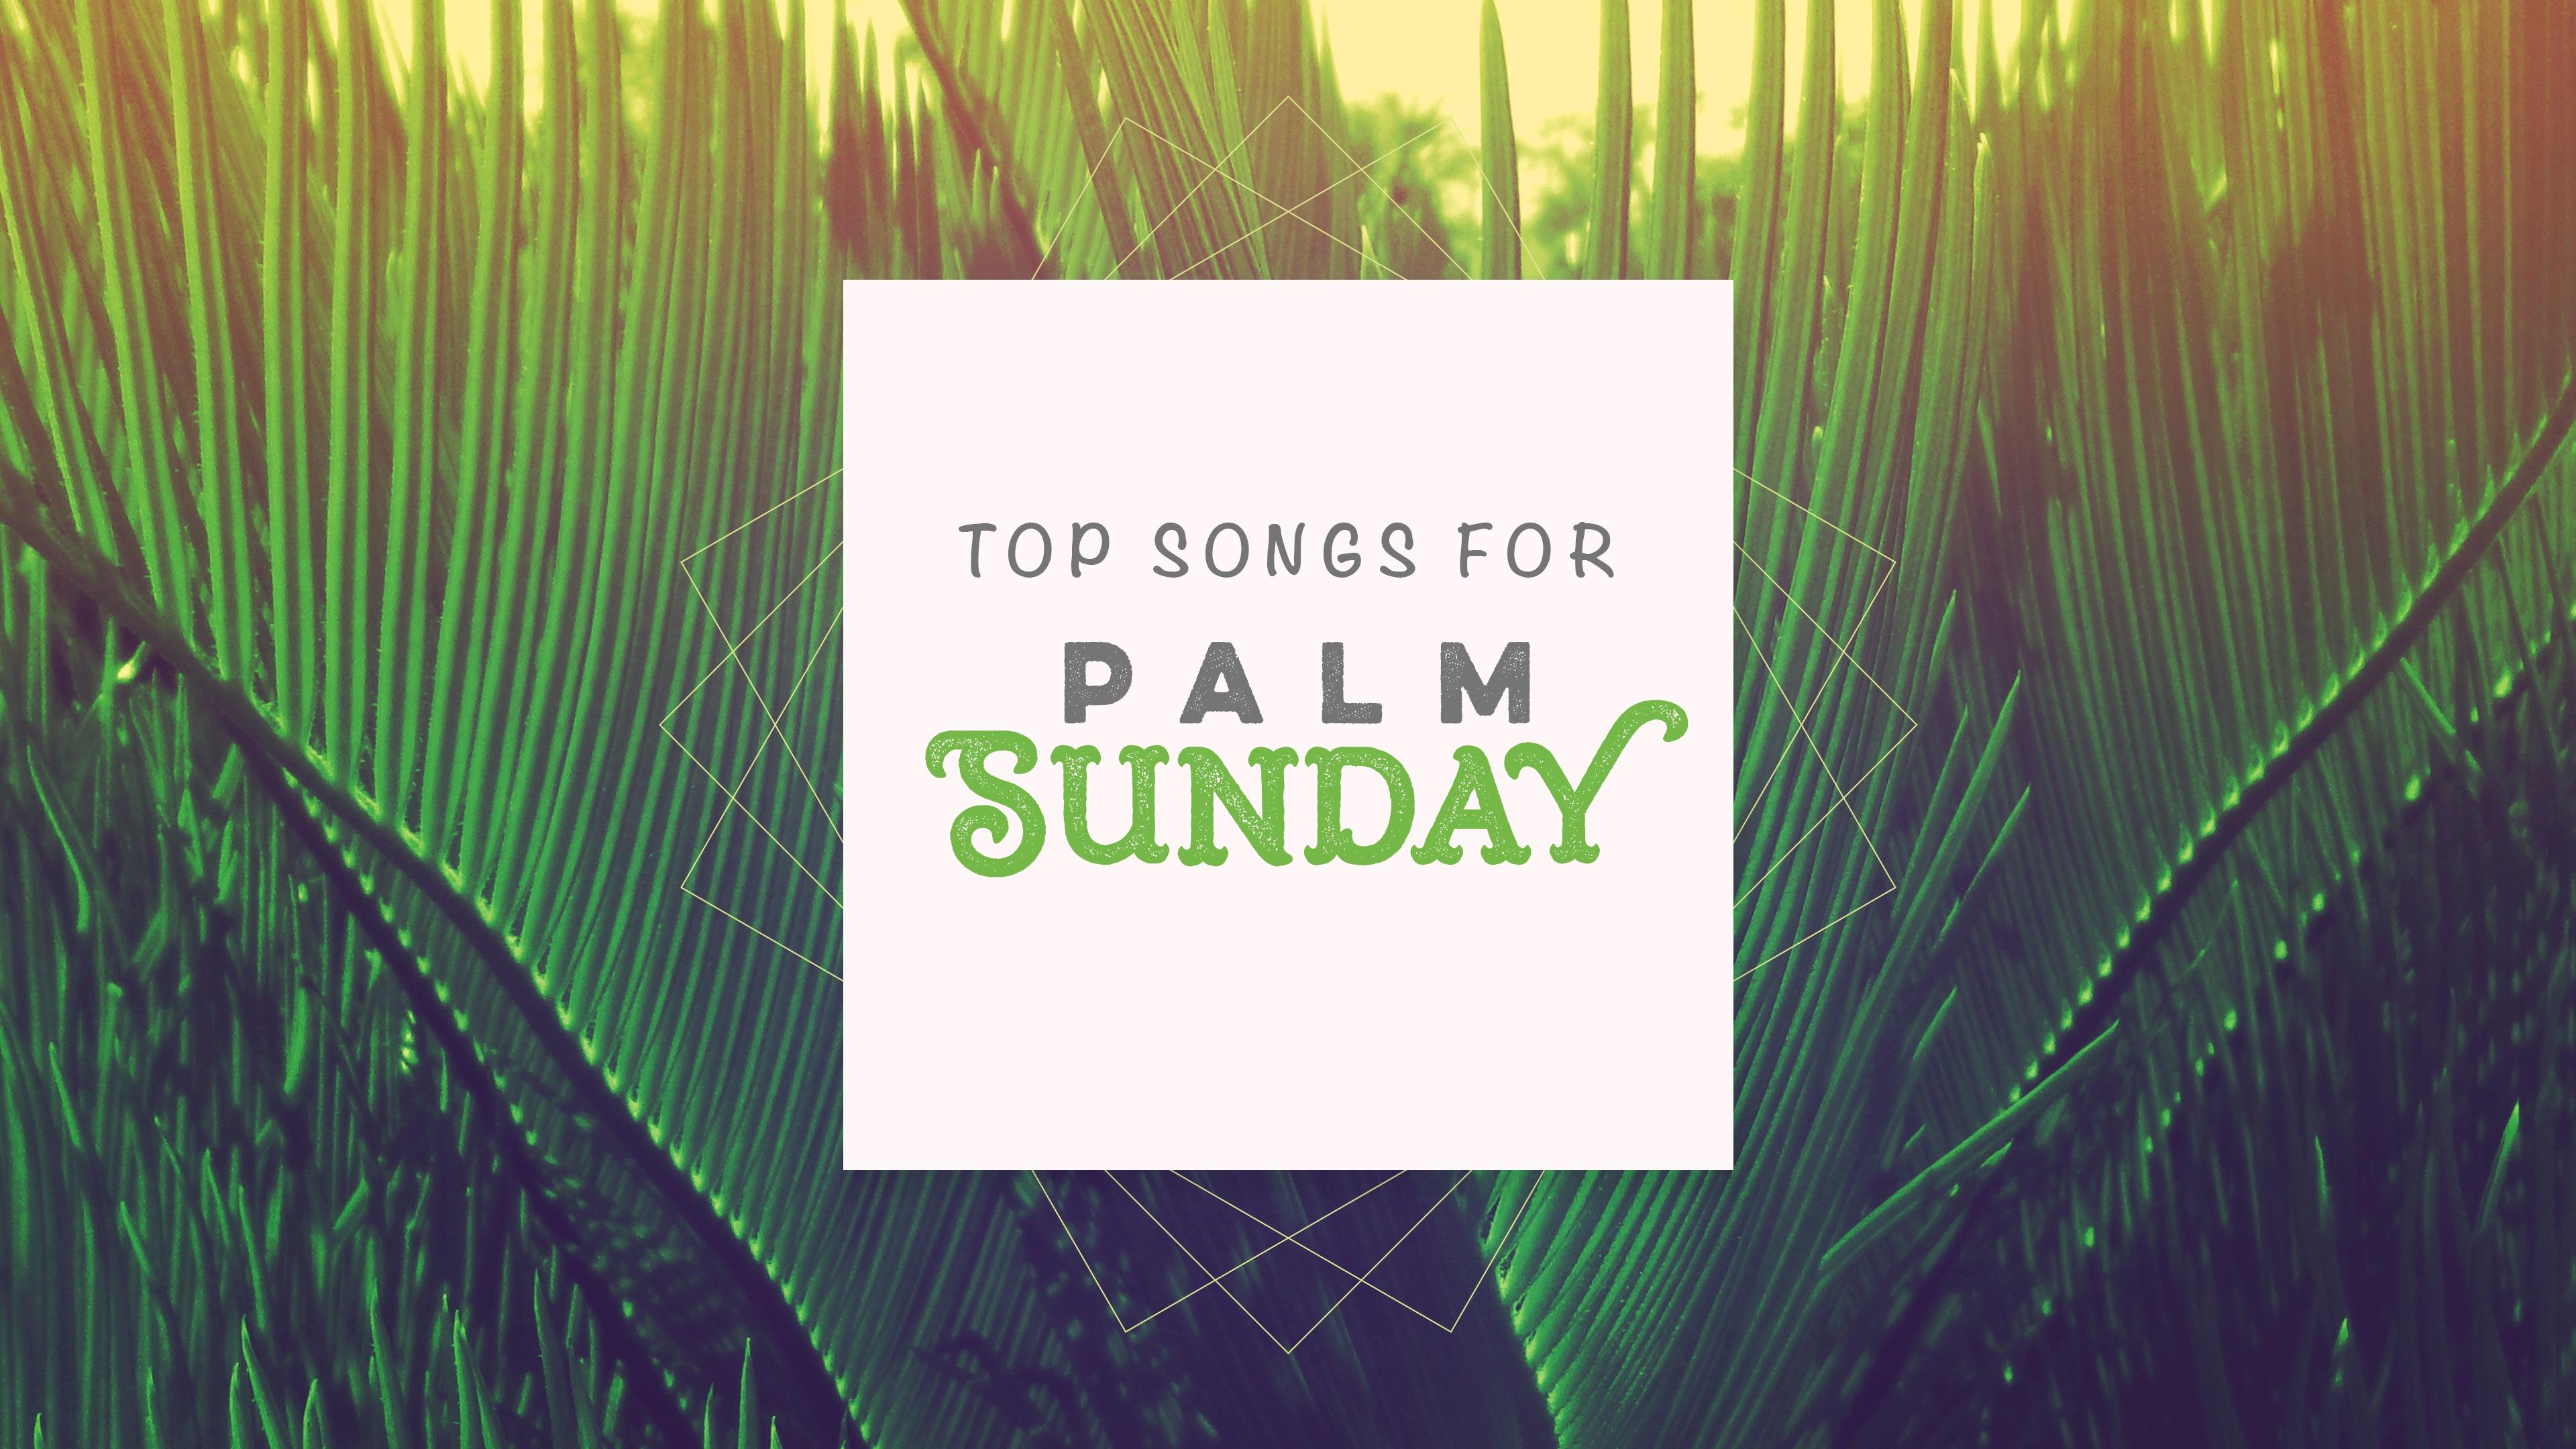 Top Songs for Palm Sunday Services Sharefaith Magazine 3840x2160